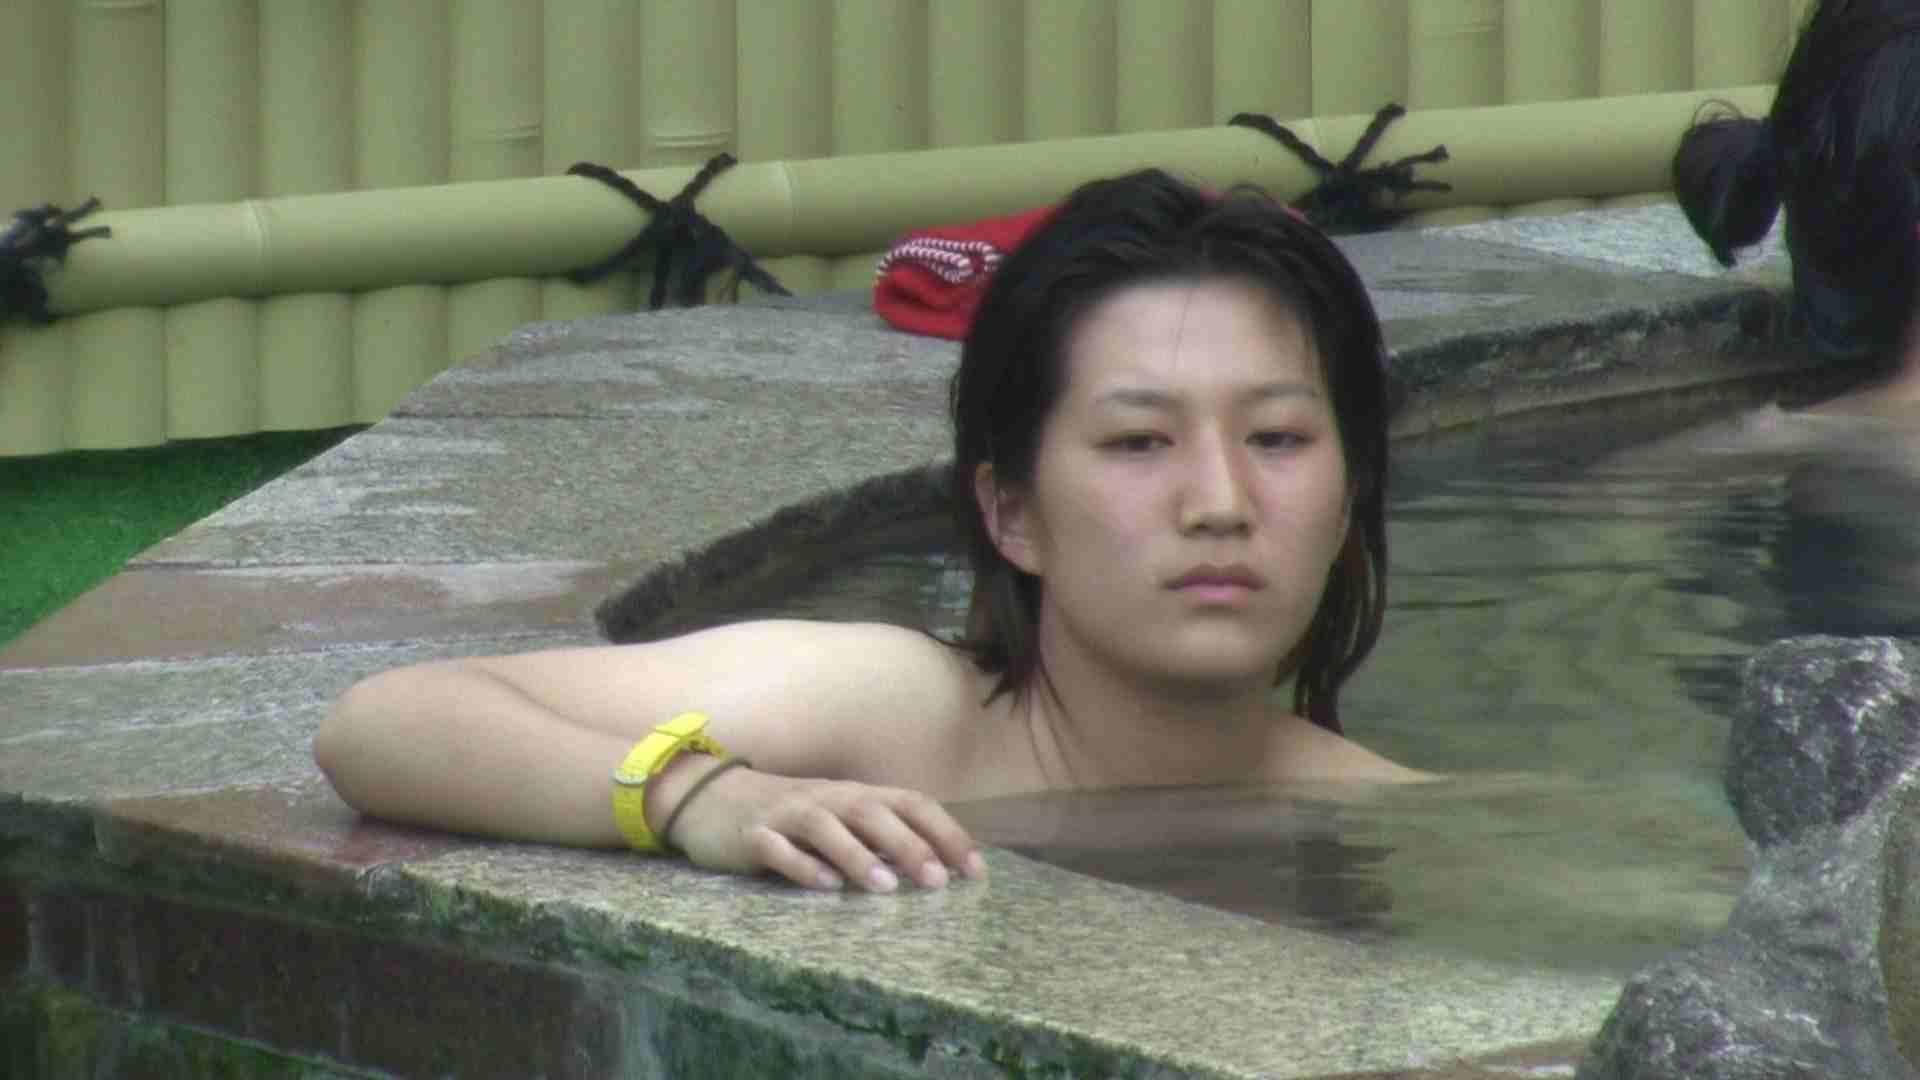 Aquaな露天風呂Vol.132 盗撮映像  31Pix 9